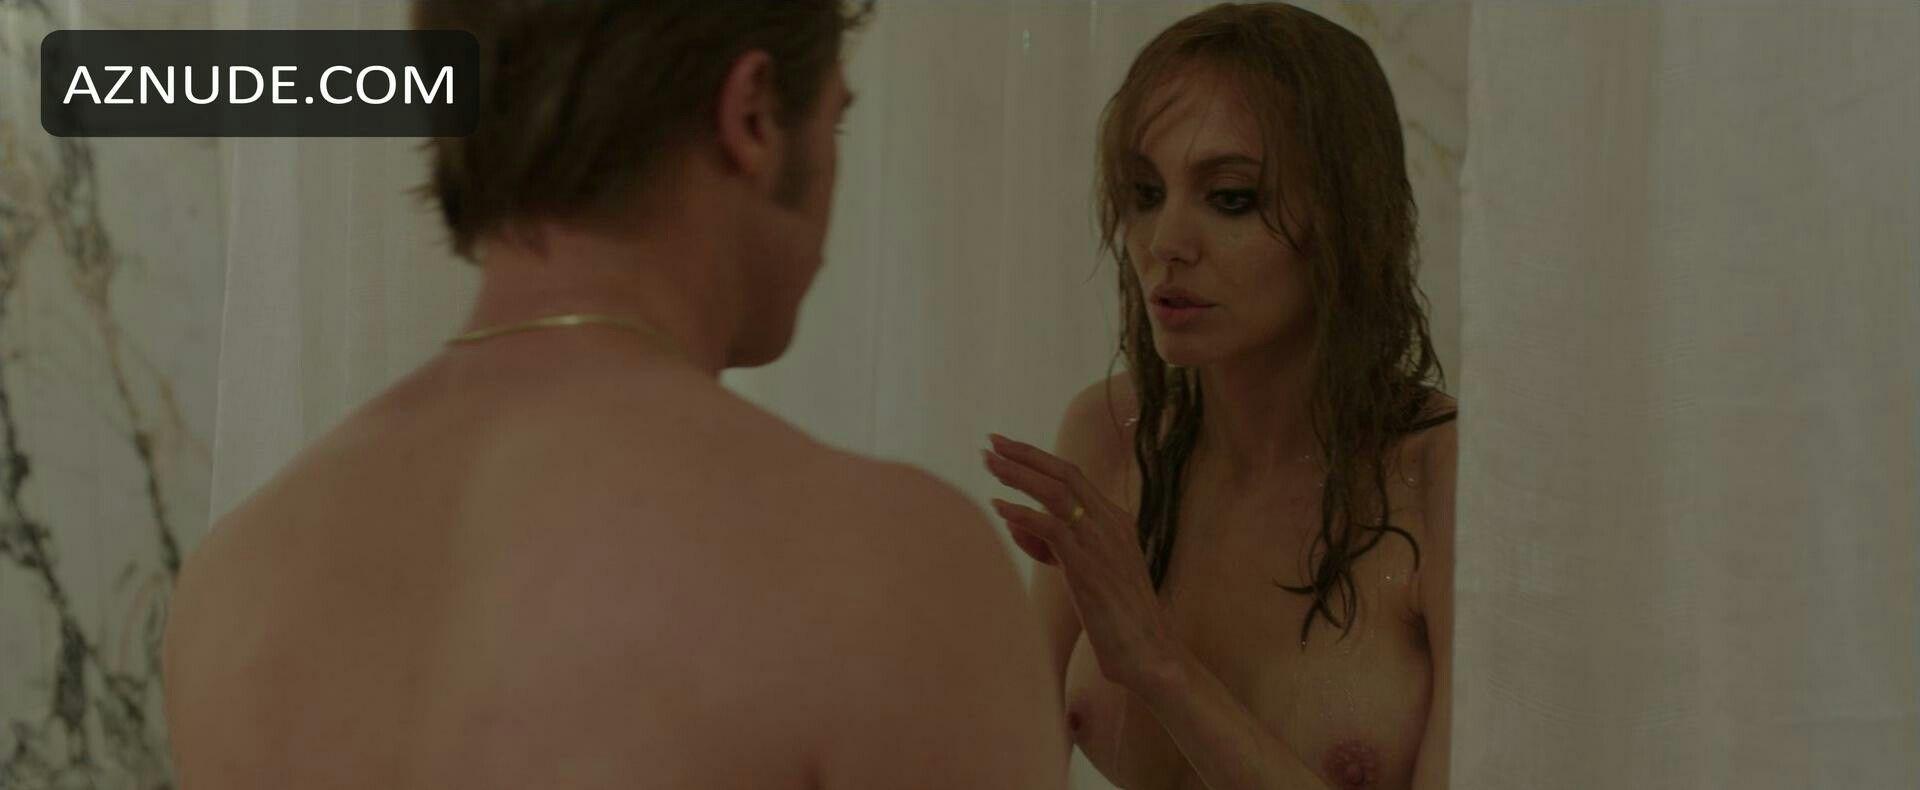 Angelina Jolie Mojave Moon Nude pornstars photo name (tuanahayab) on pinterest